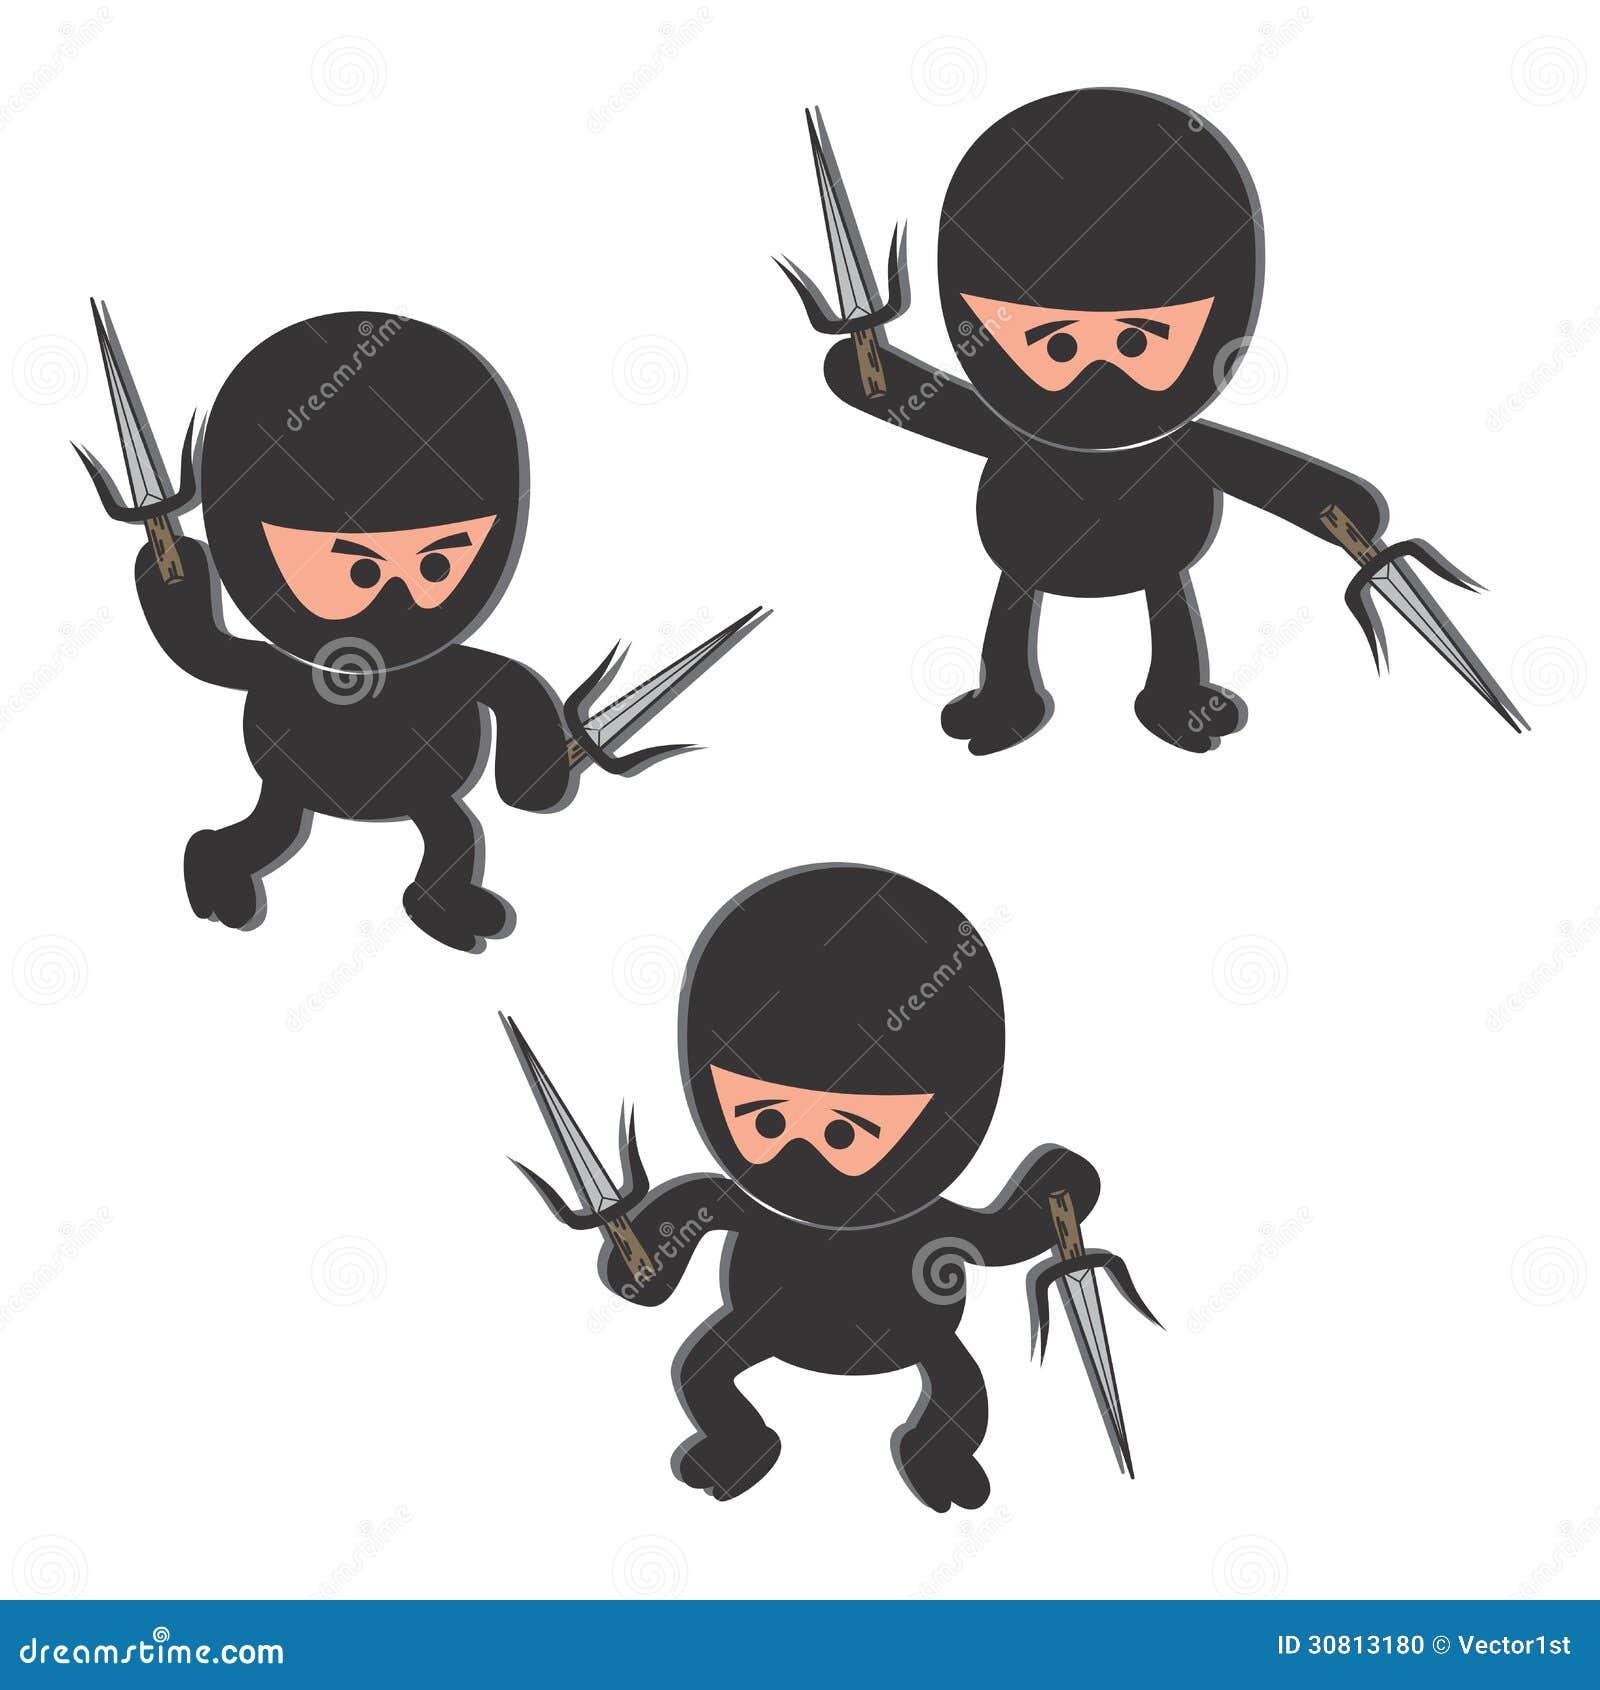 Graphic Design Cartoon Character : Ninja cartoon character stock photo image